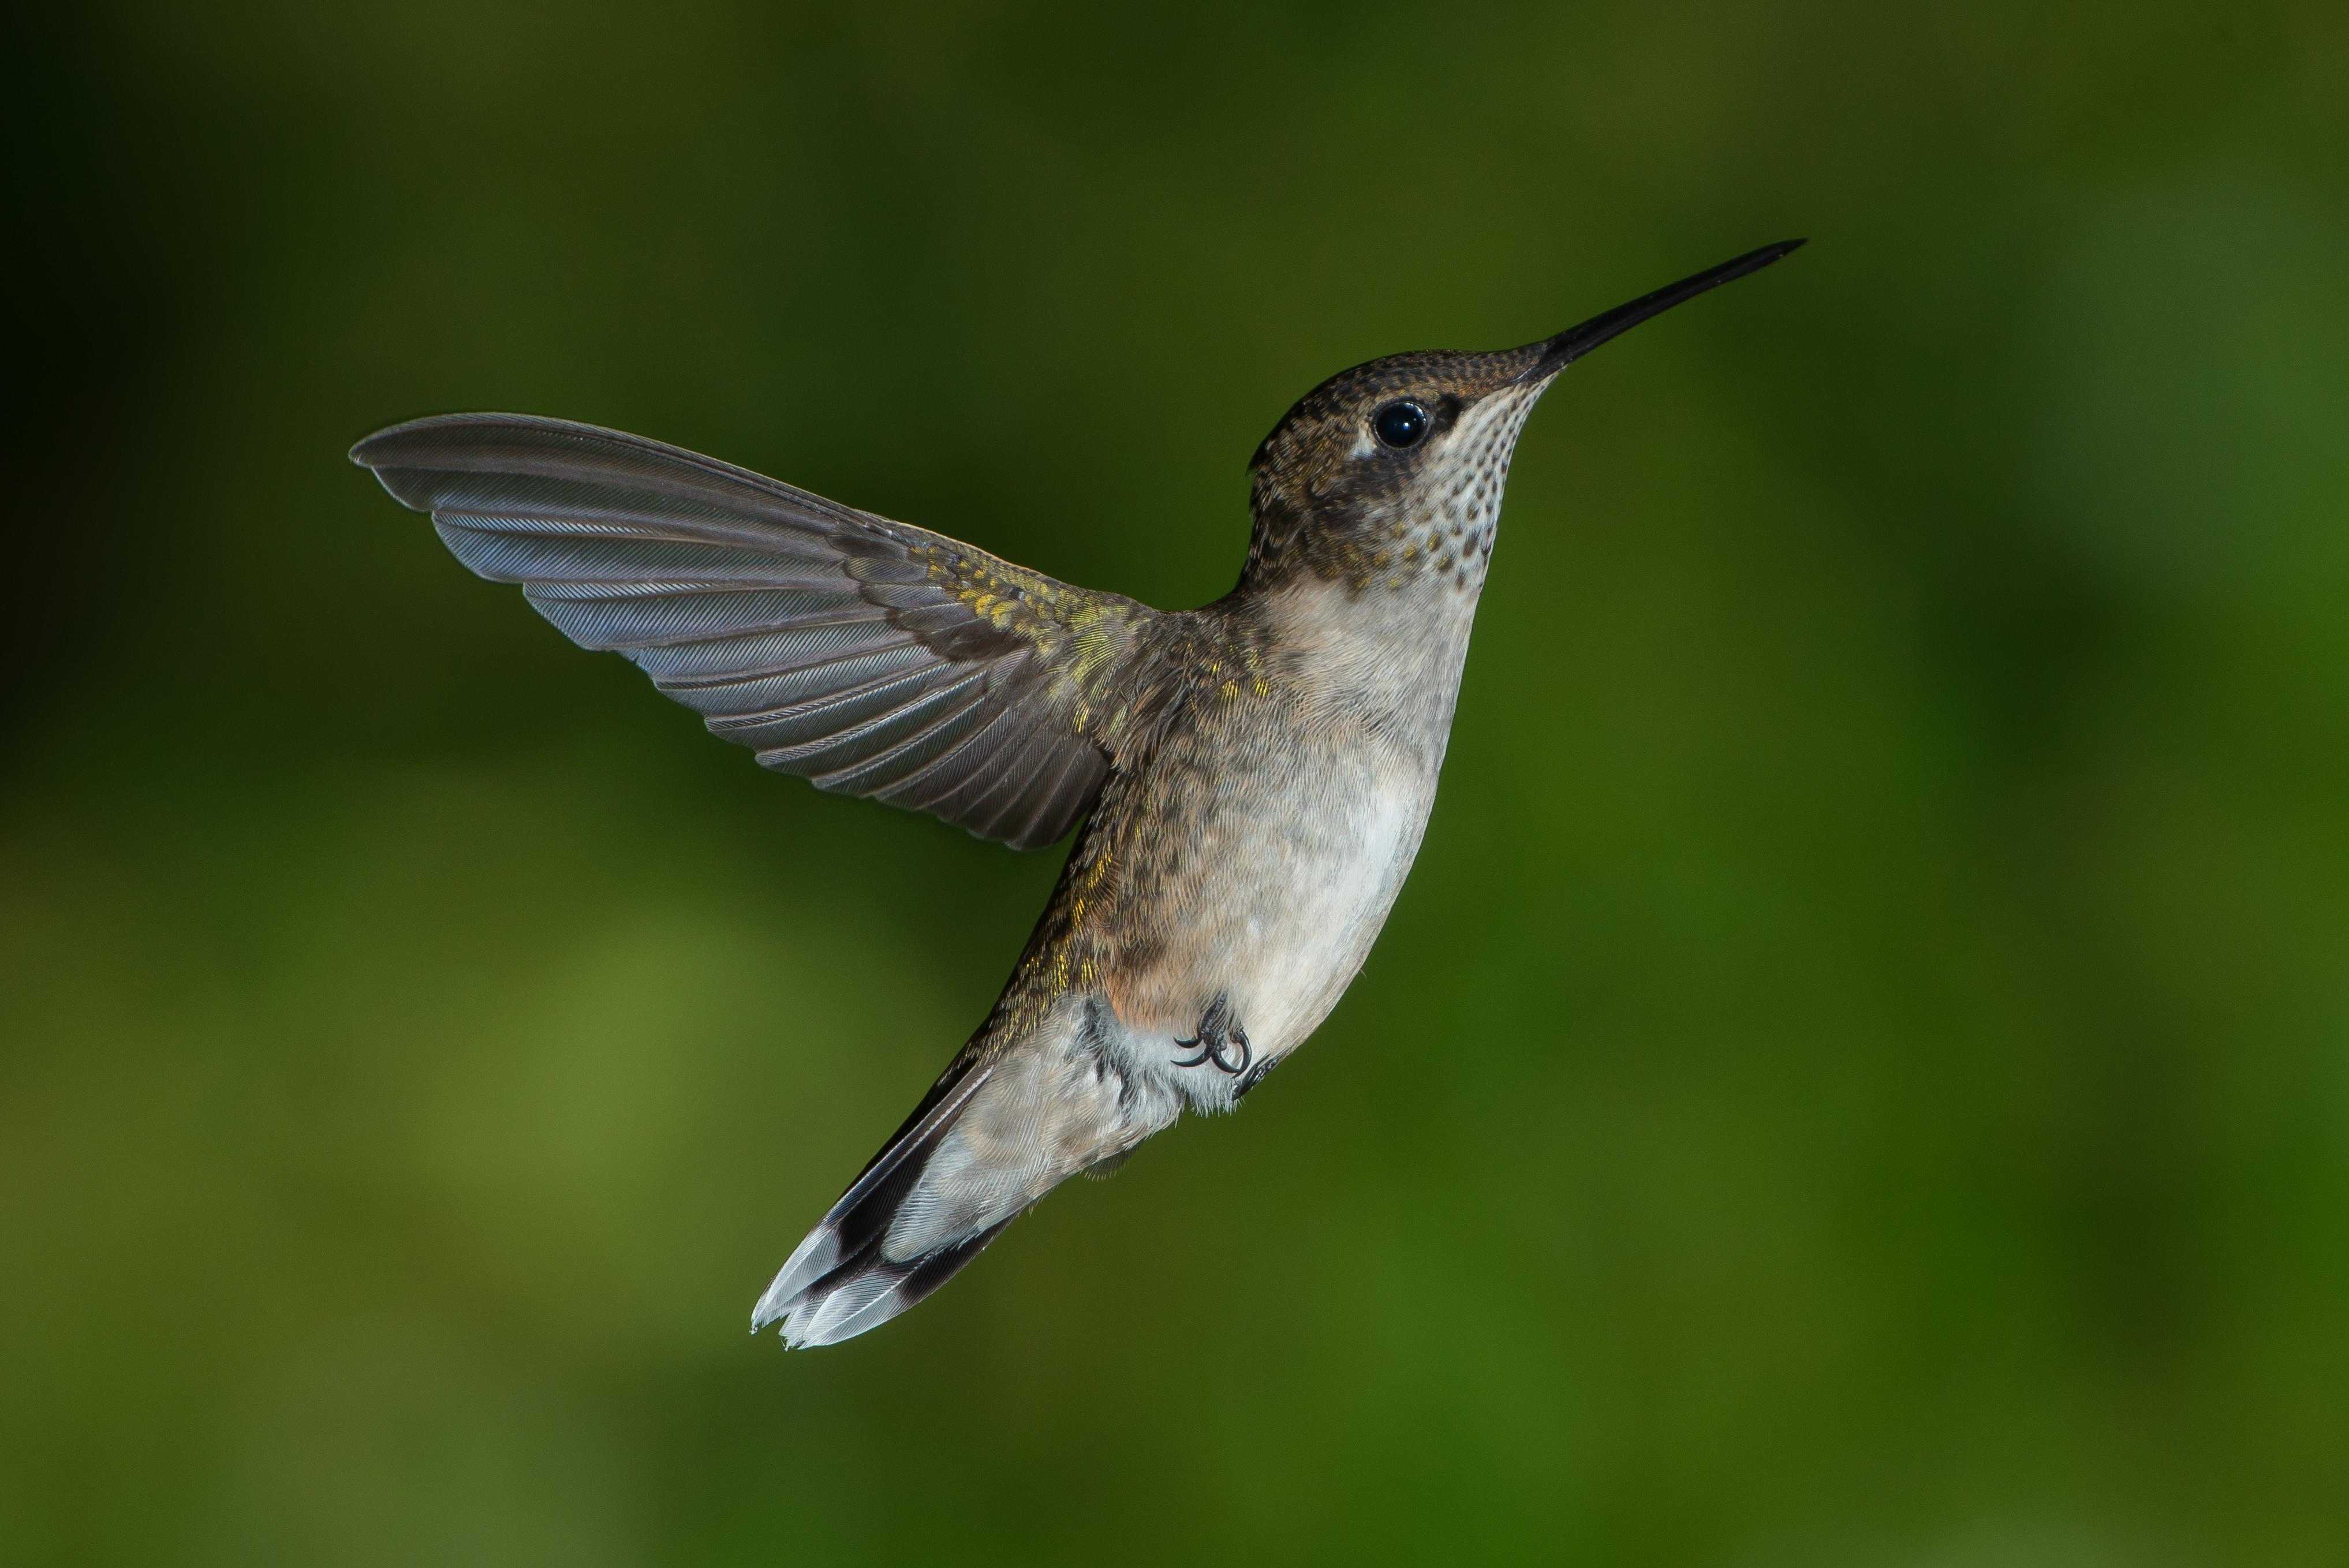 File:Juvenile Male Ruby-throated Hummingbird.jpg - Wikipedia